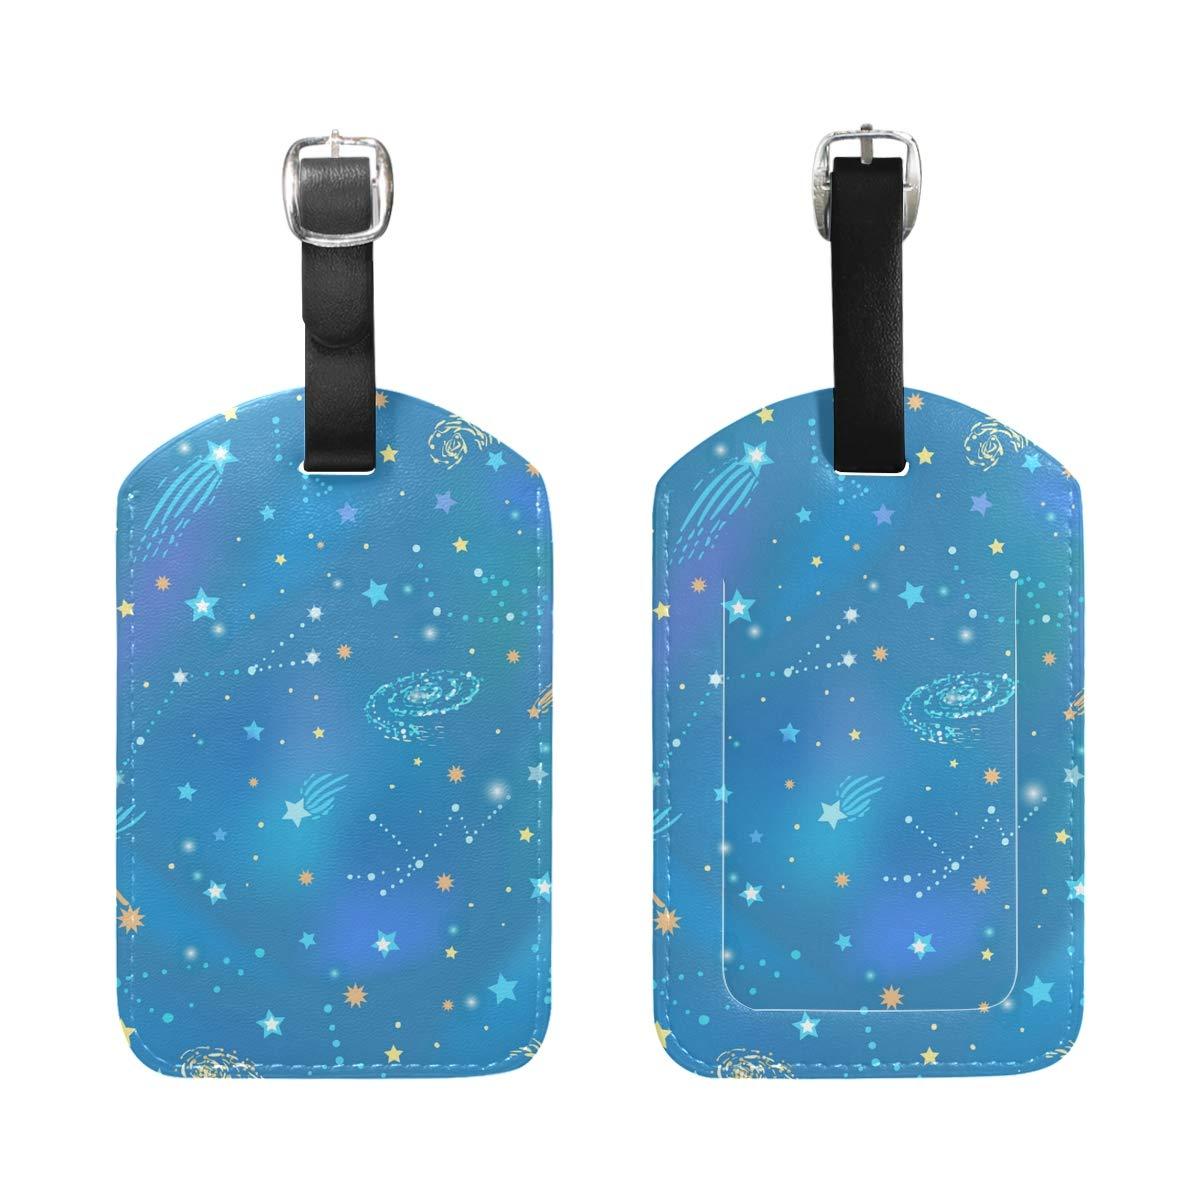 Amazon.com: Cargador Samsung Galaxy Travel Luggage Label PU ...